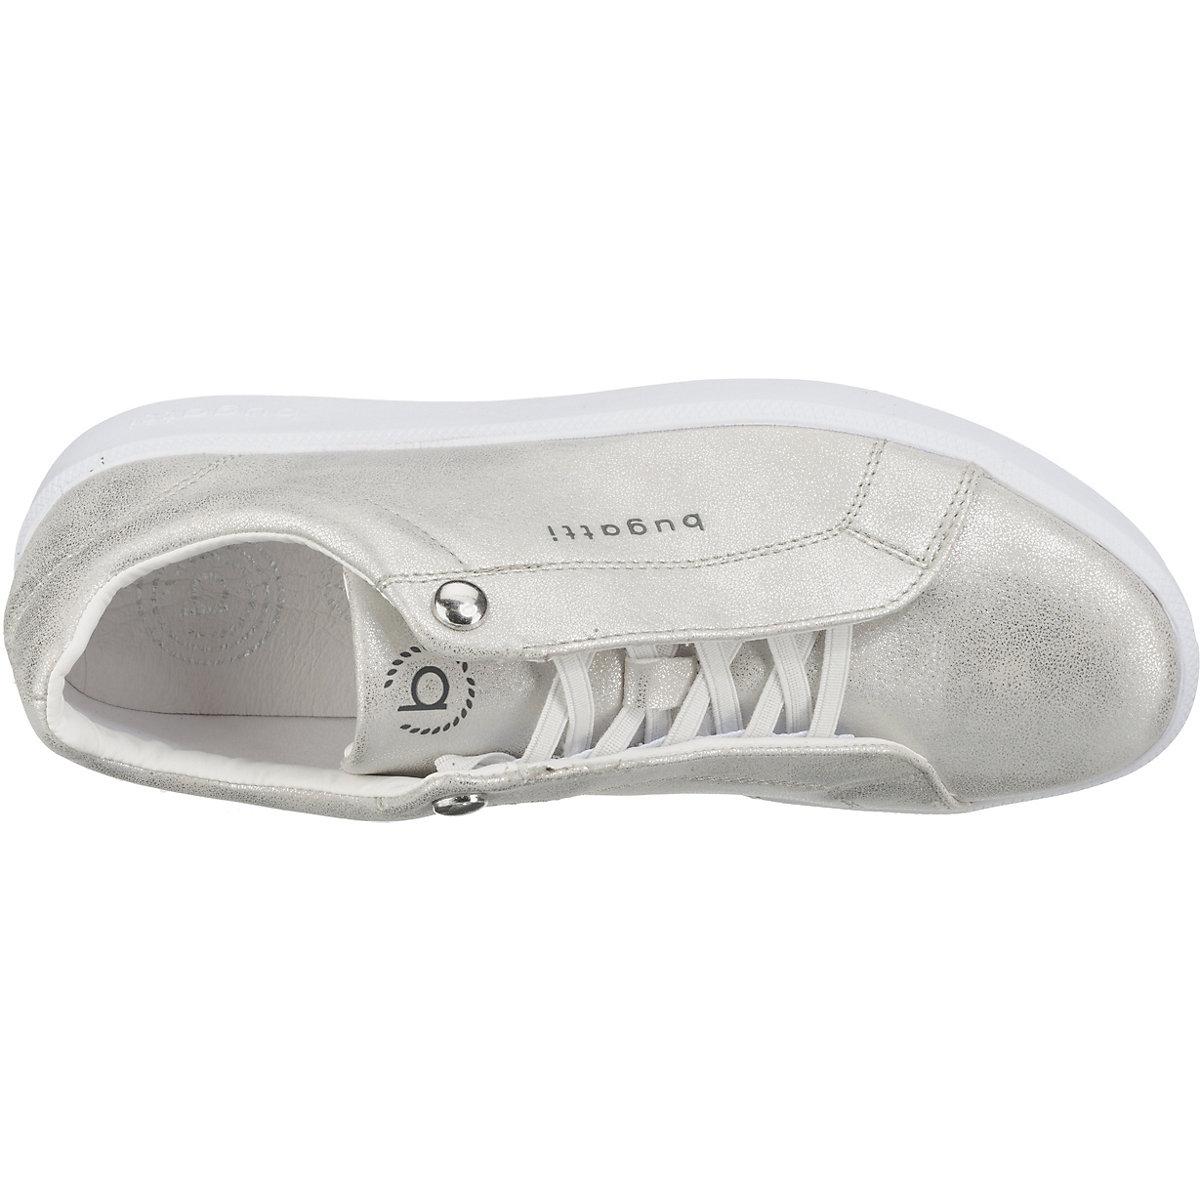 Bugatti, Sneakers Low, Silber